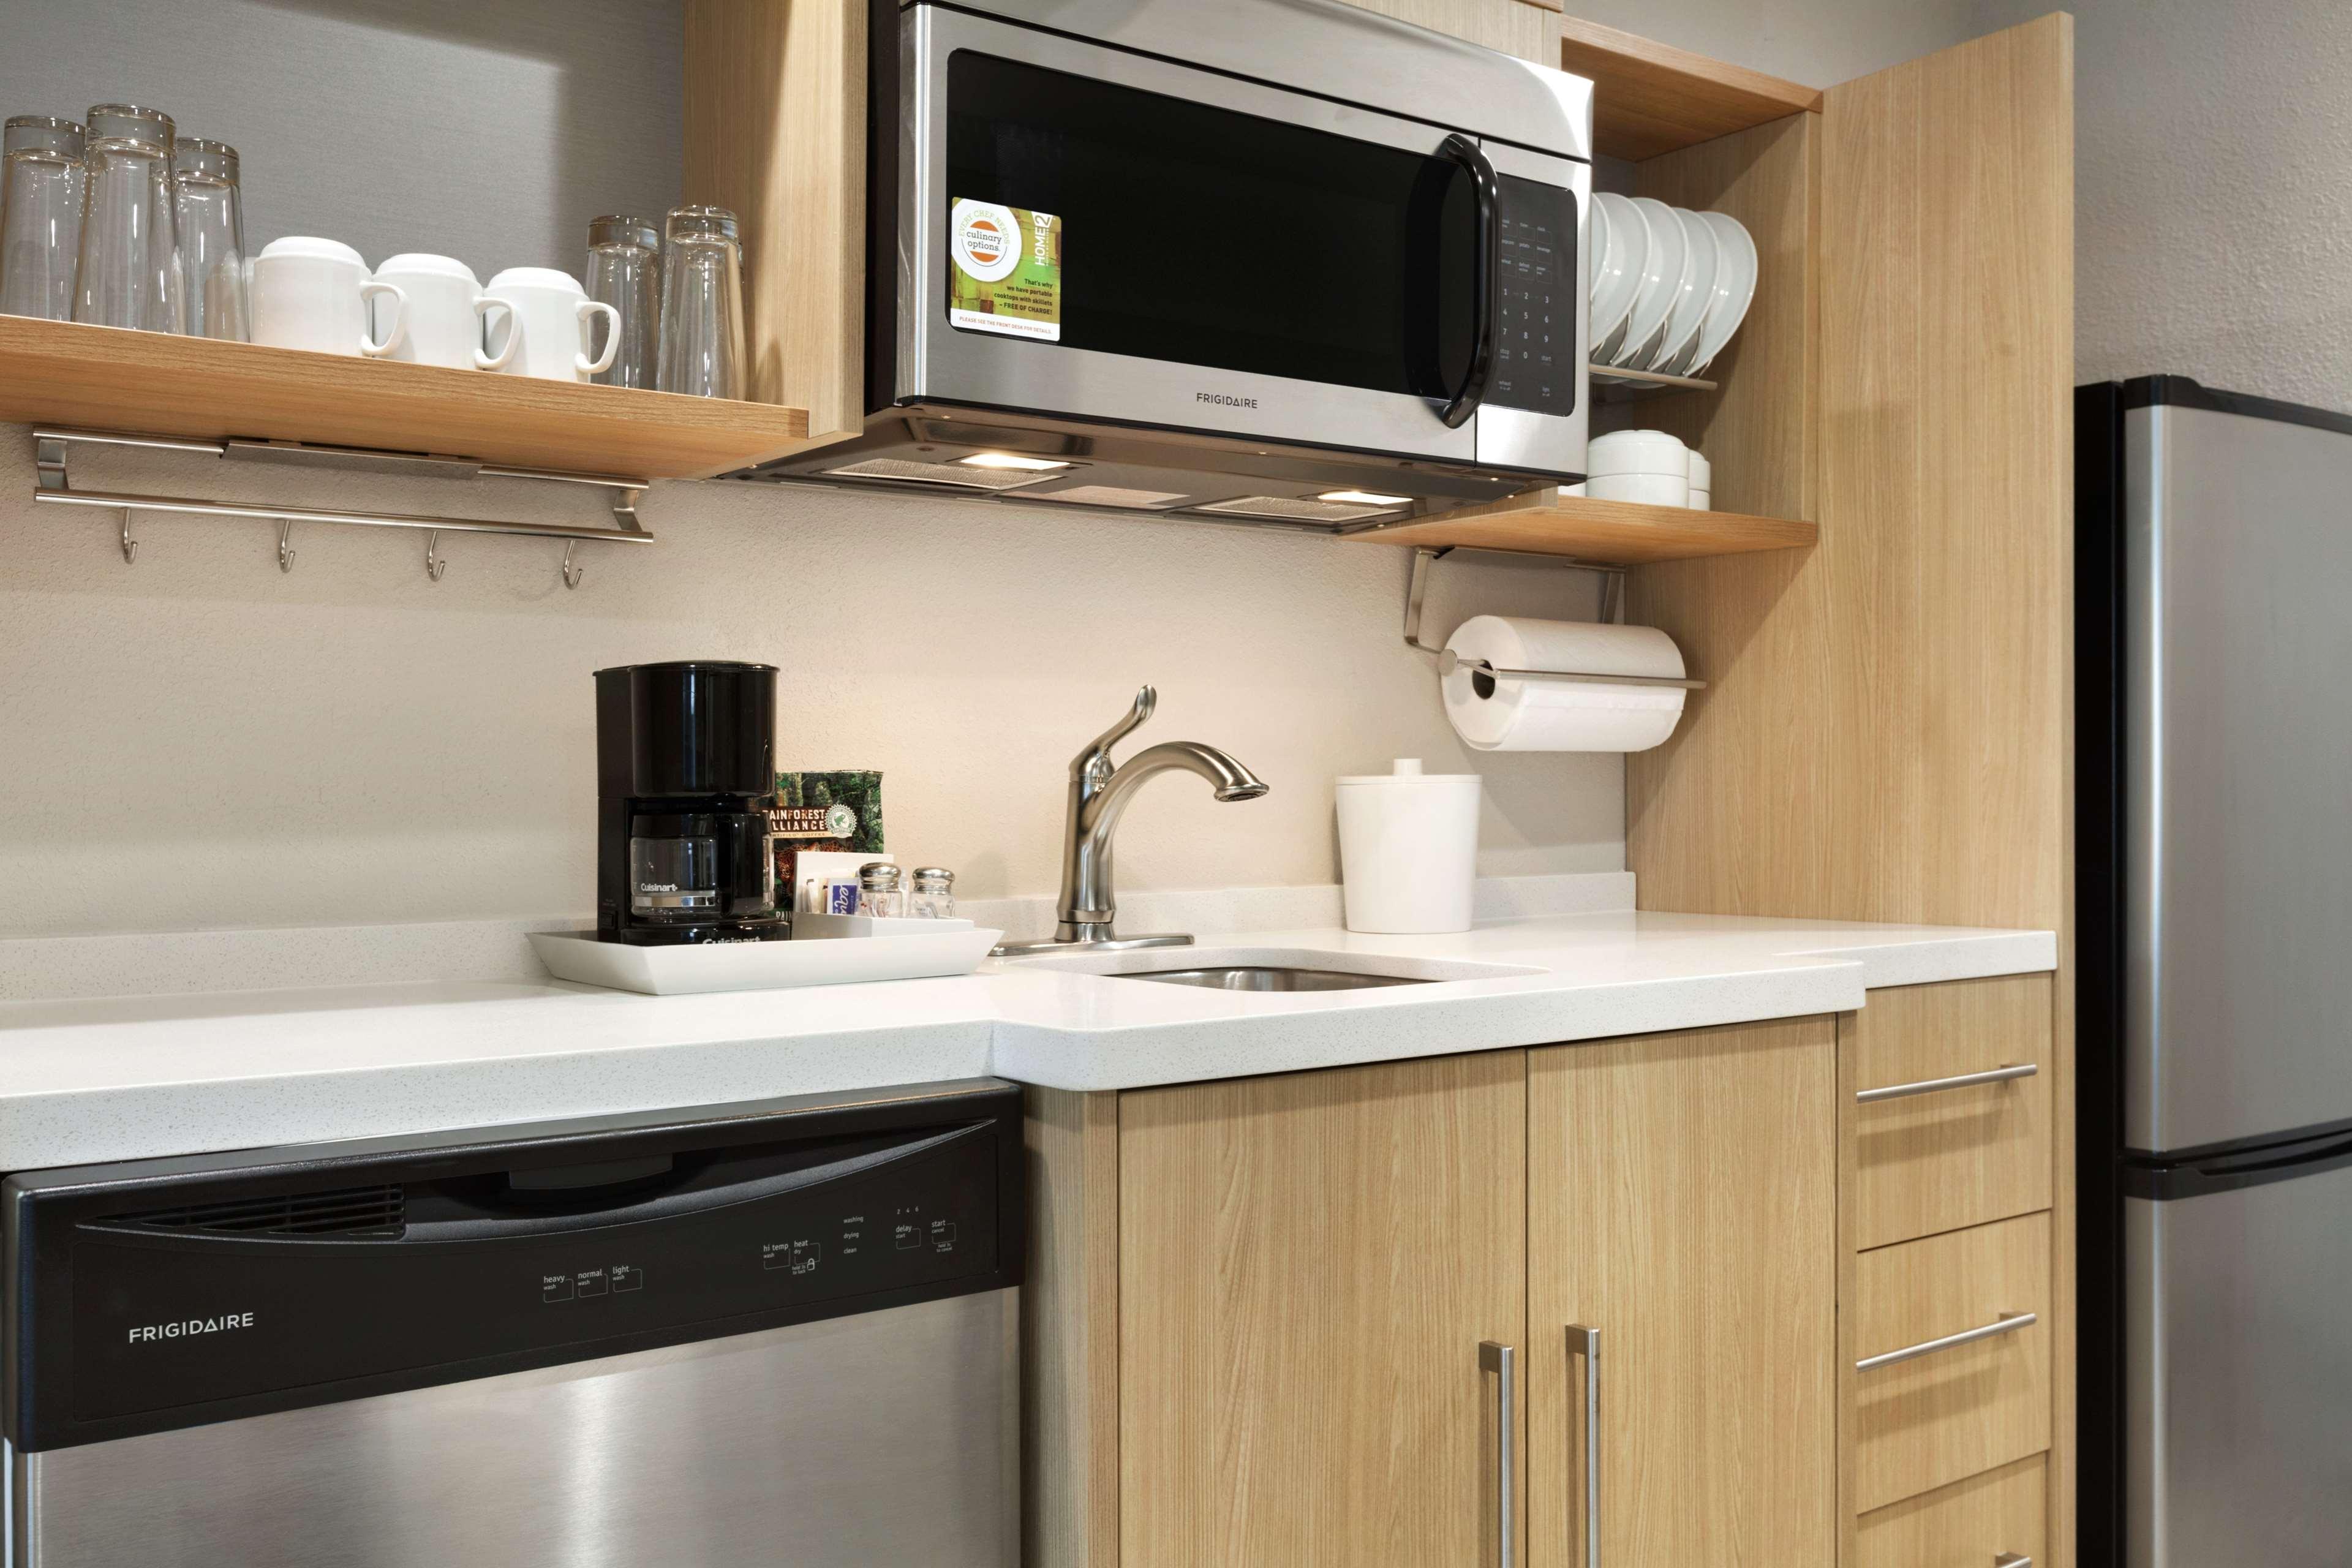 Home2 Suites by Hilton West Monroe image 16